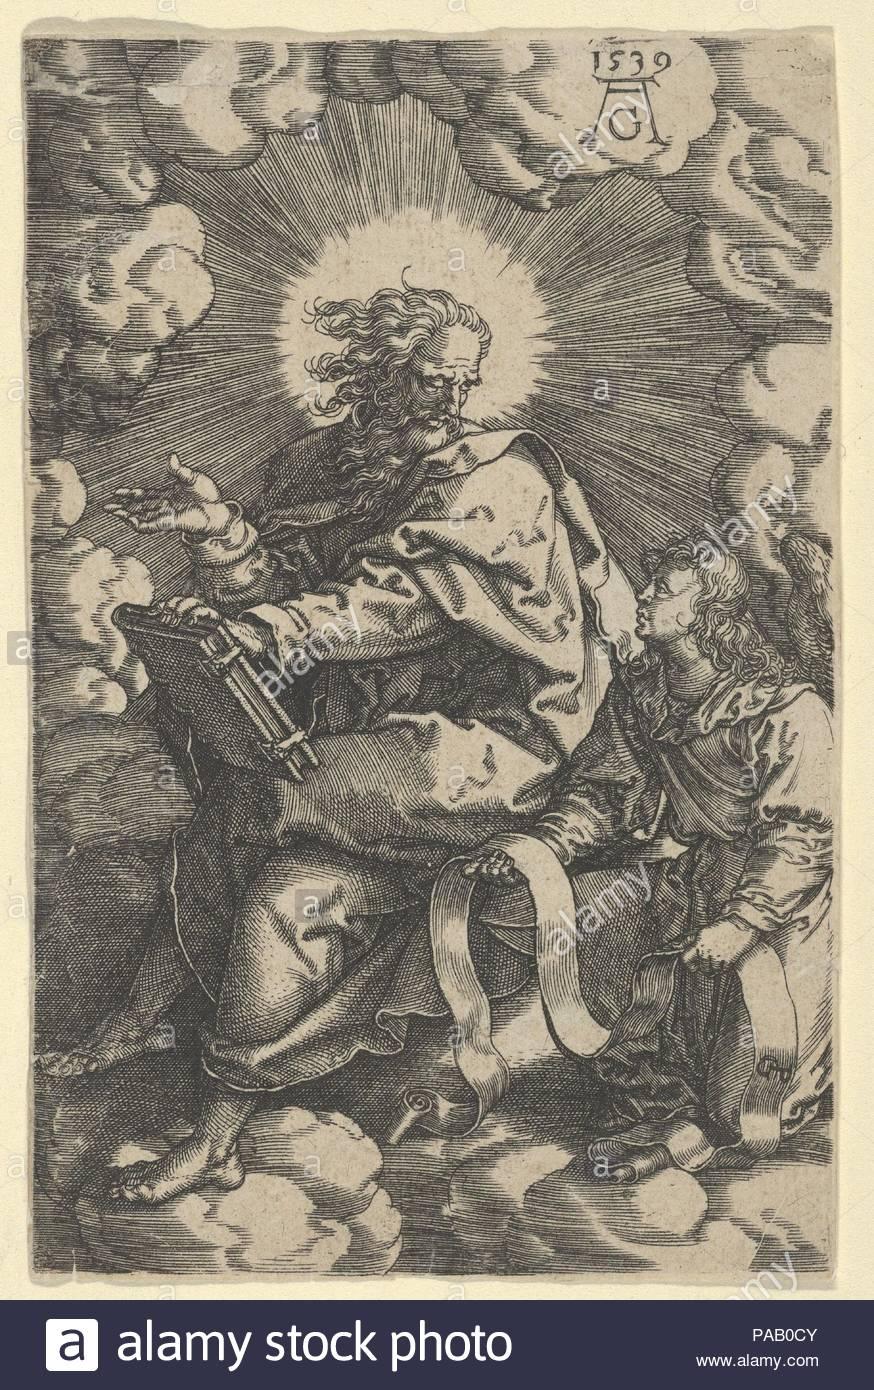 Saint Matthew, from The Four Evangelists. Artist: Heinrich Aldegrever (German, Paderborn ca. 1502-1555/1561 Soest); after Georg Pencz (German, Wroclaw ca. 1500-1550 Leipzig). Dimensions: Sheet: 4 5/8 × 2 15/16 in. (11.7 × 7.5 cm). Date: 1539. Museum: Metropolitan Museum of Art, New York, USA. - Stock Image